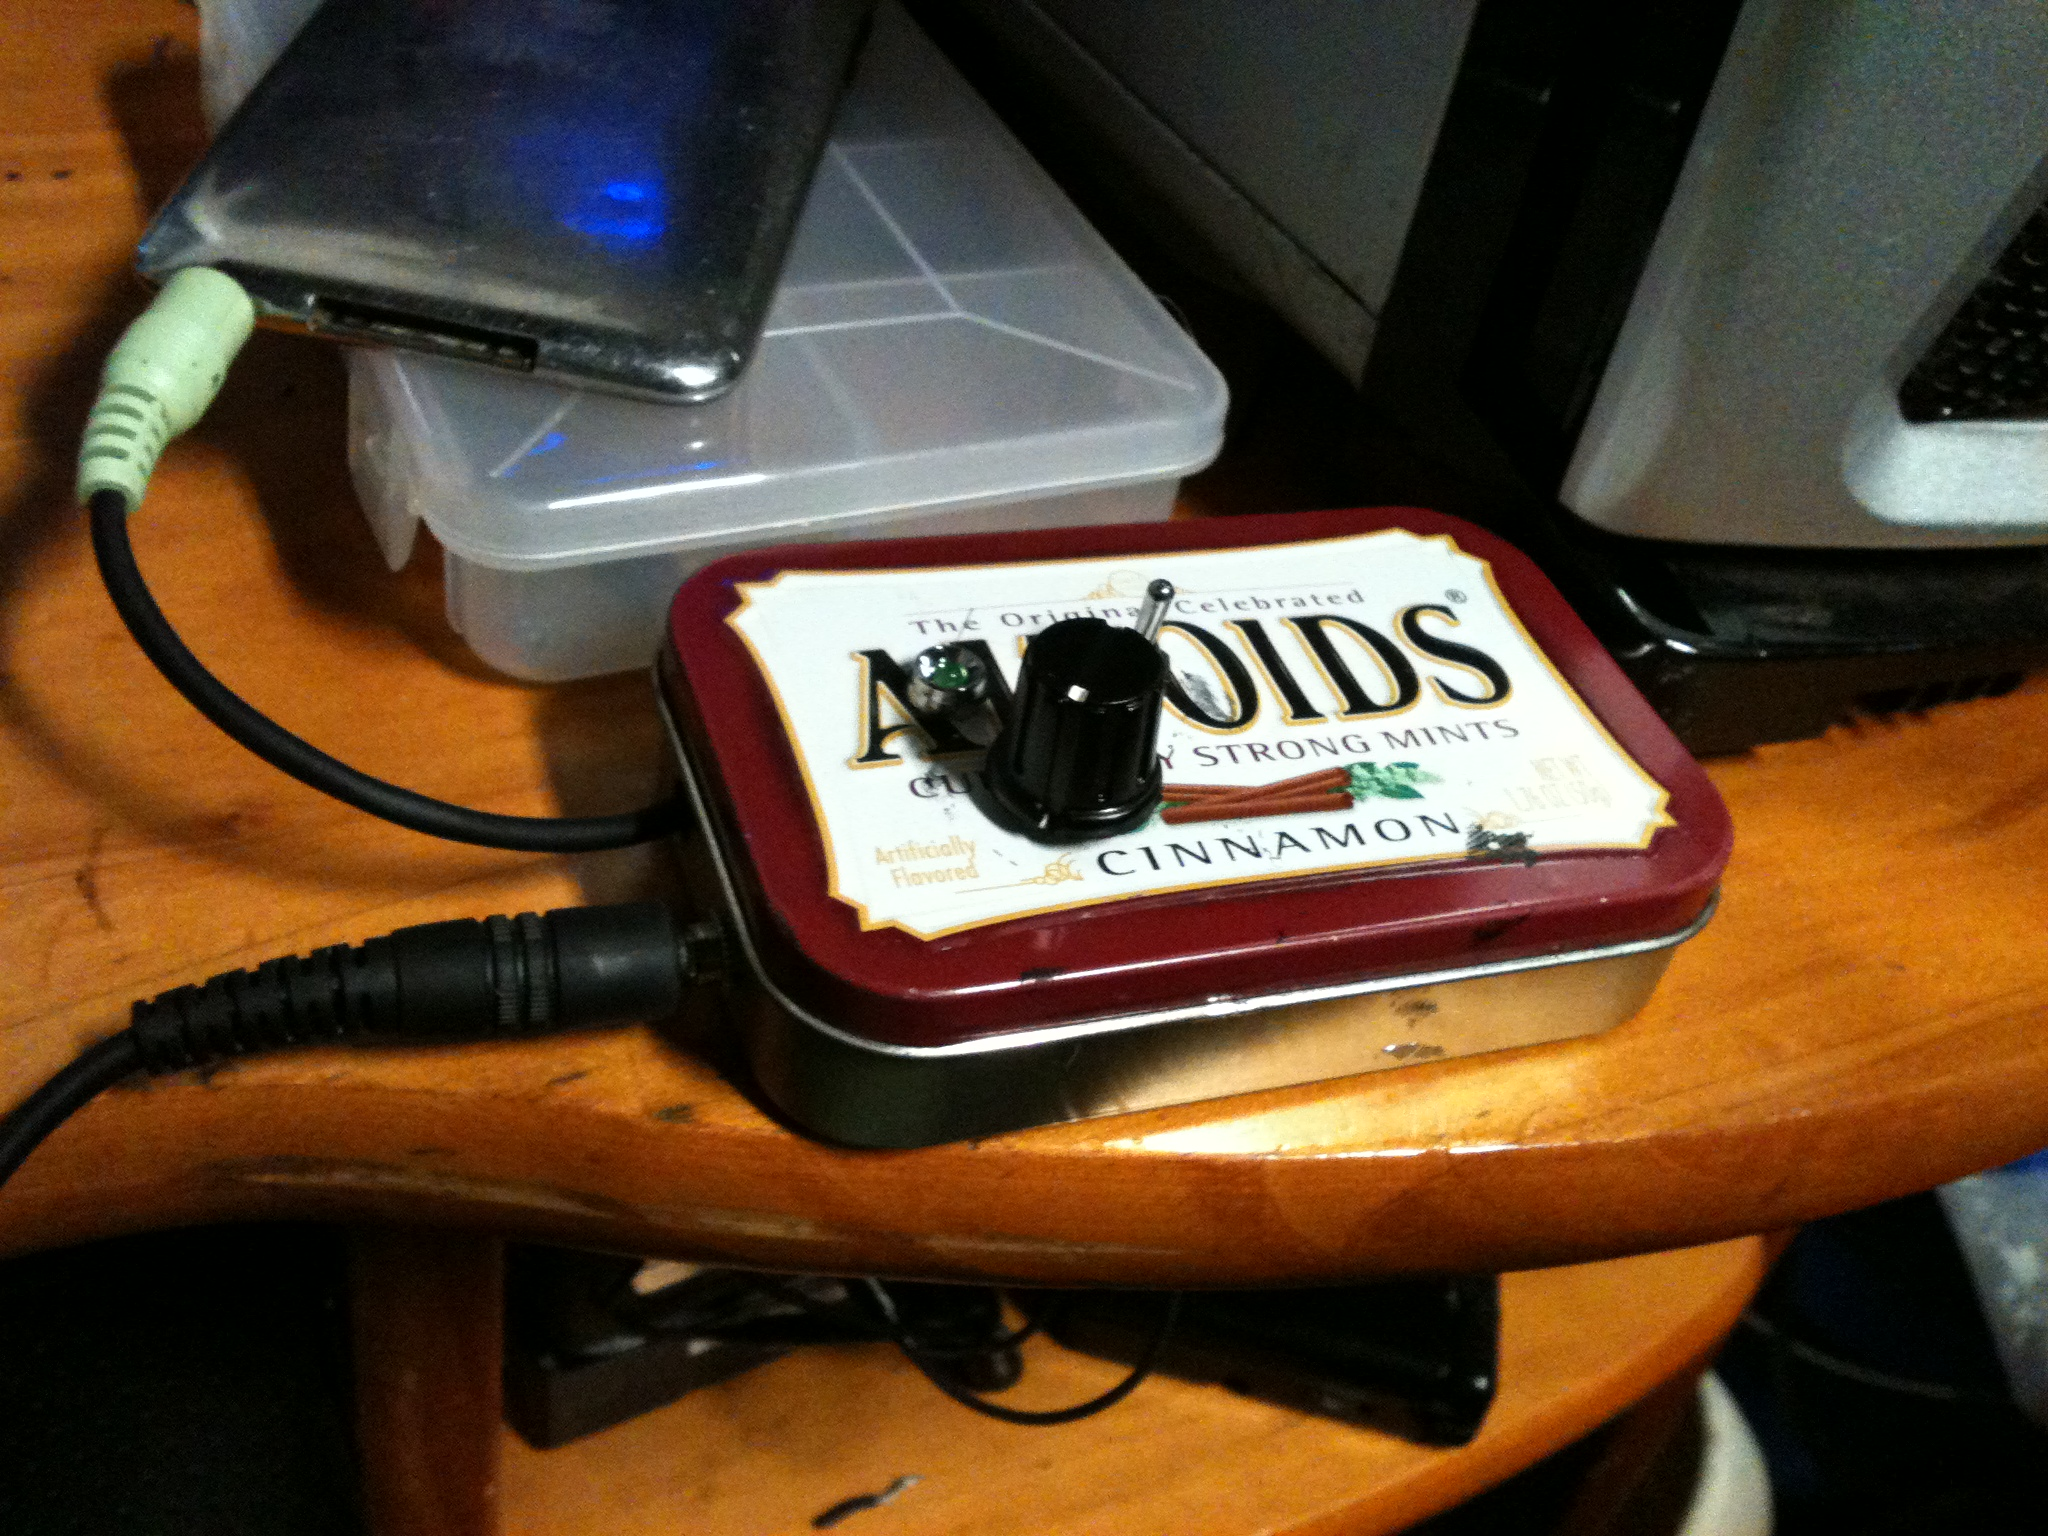 My first Cmoy headphone amp!